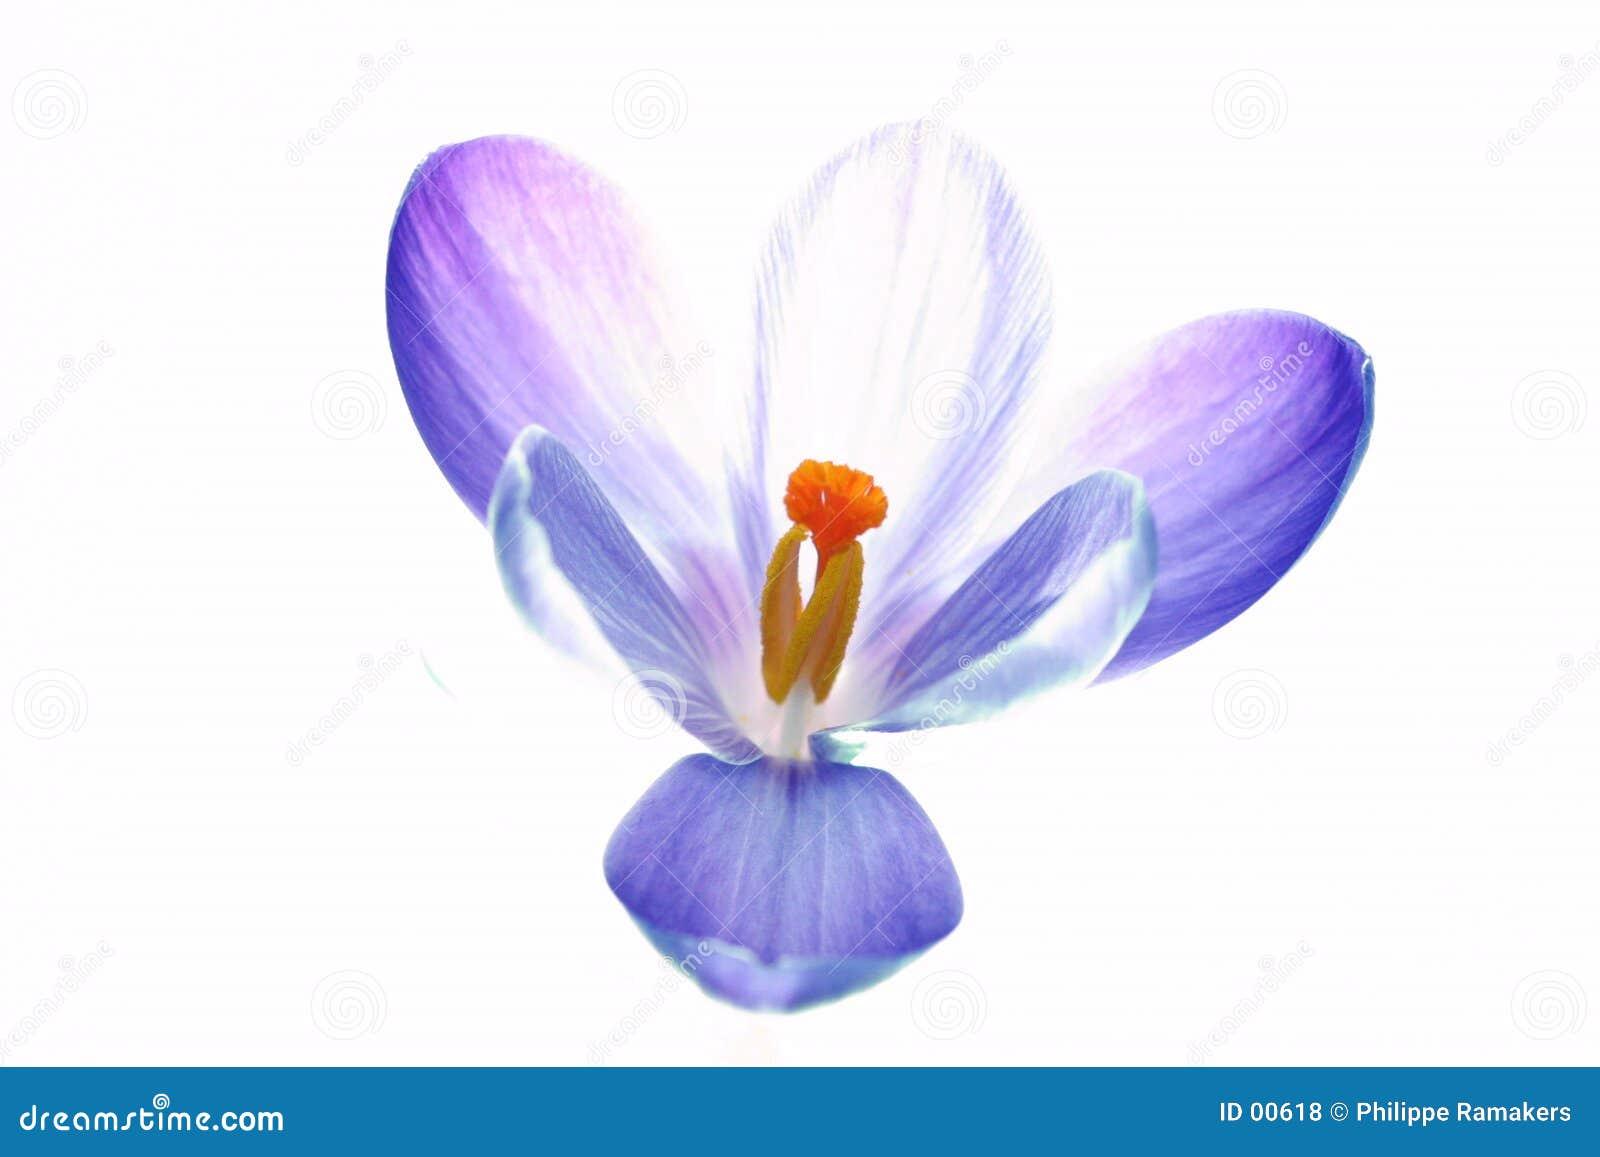 Pure crocus flower